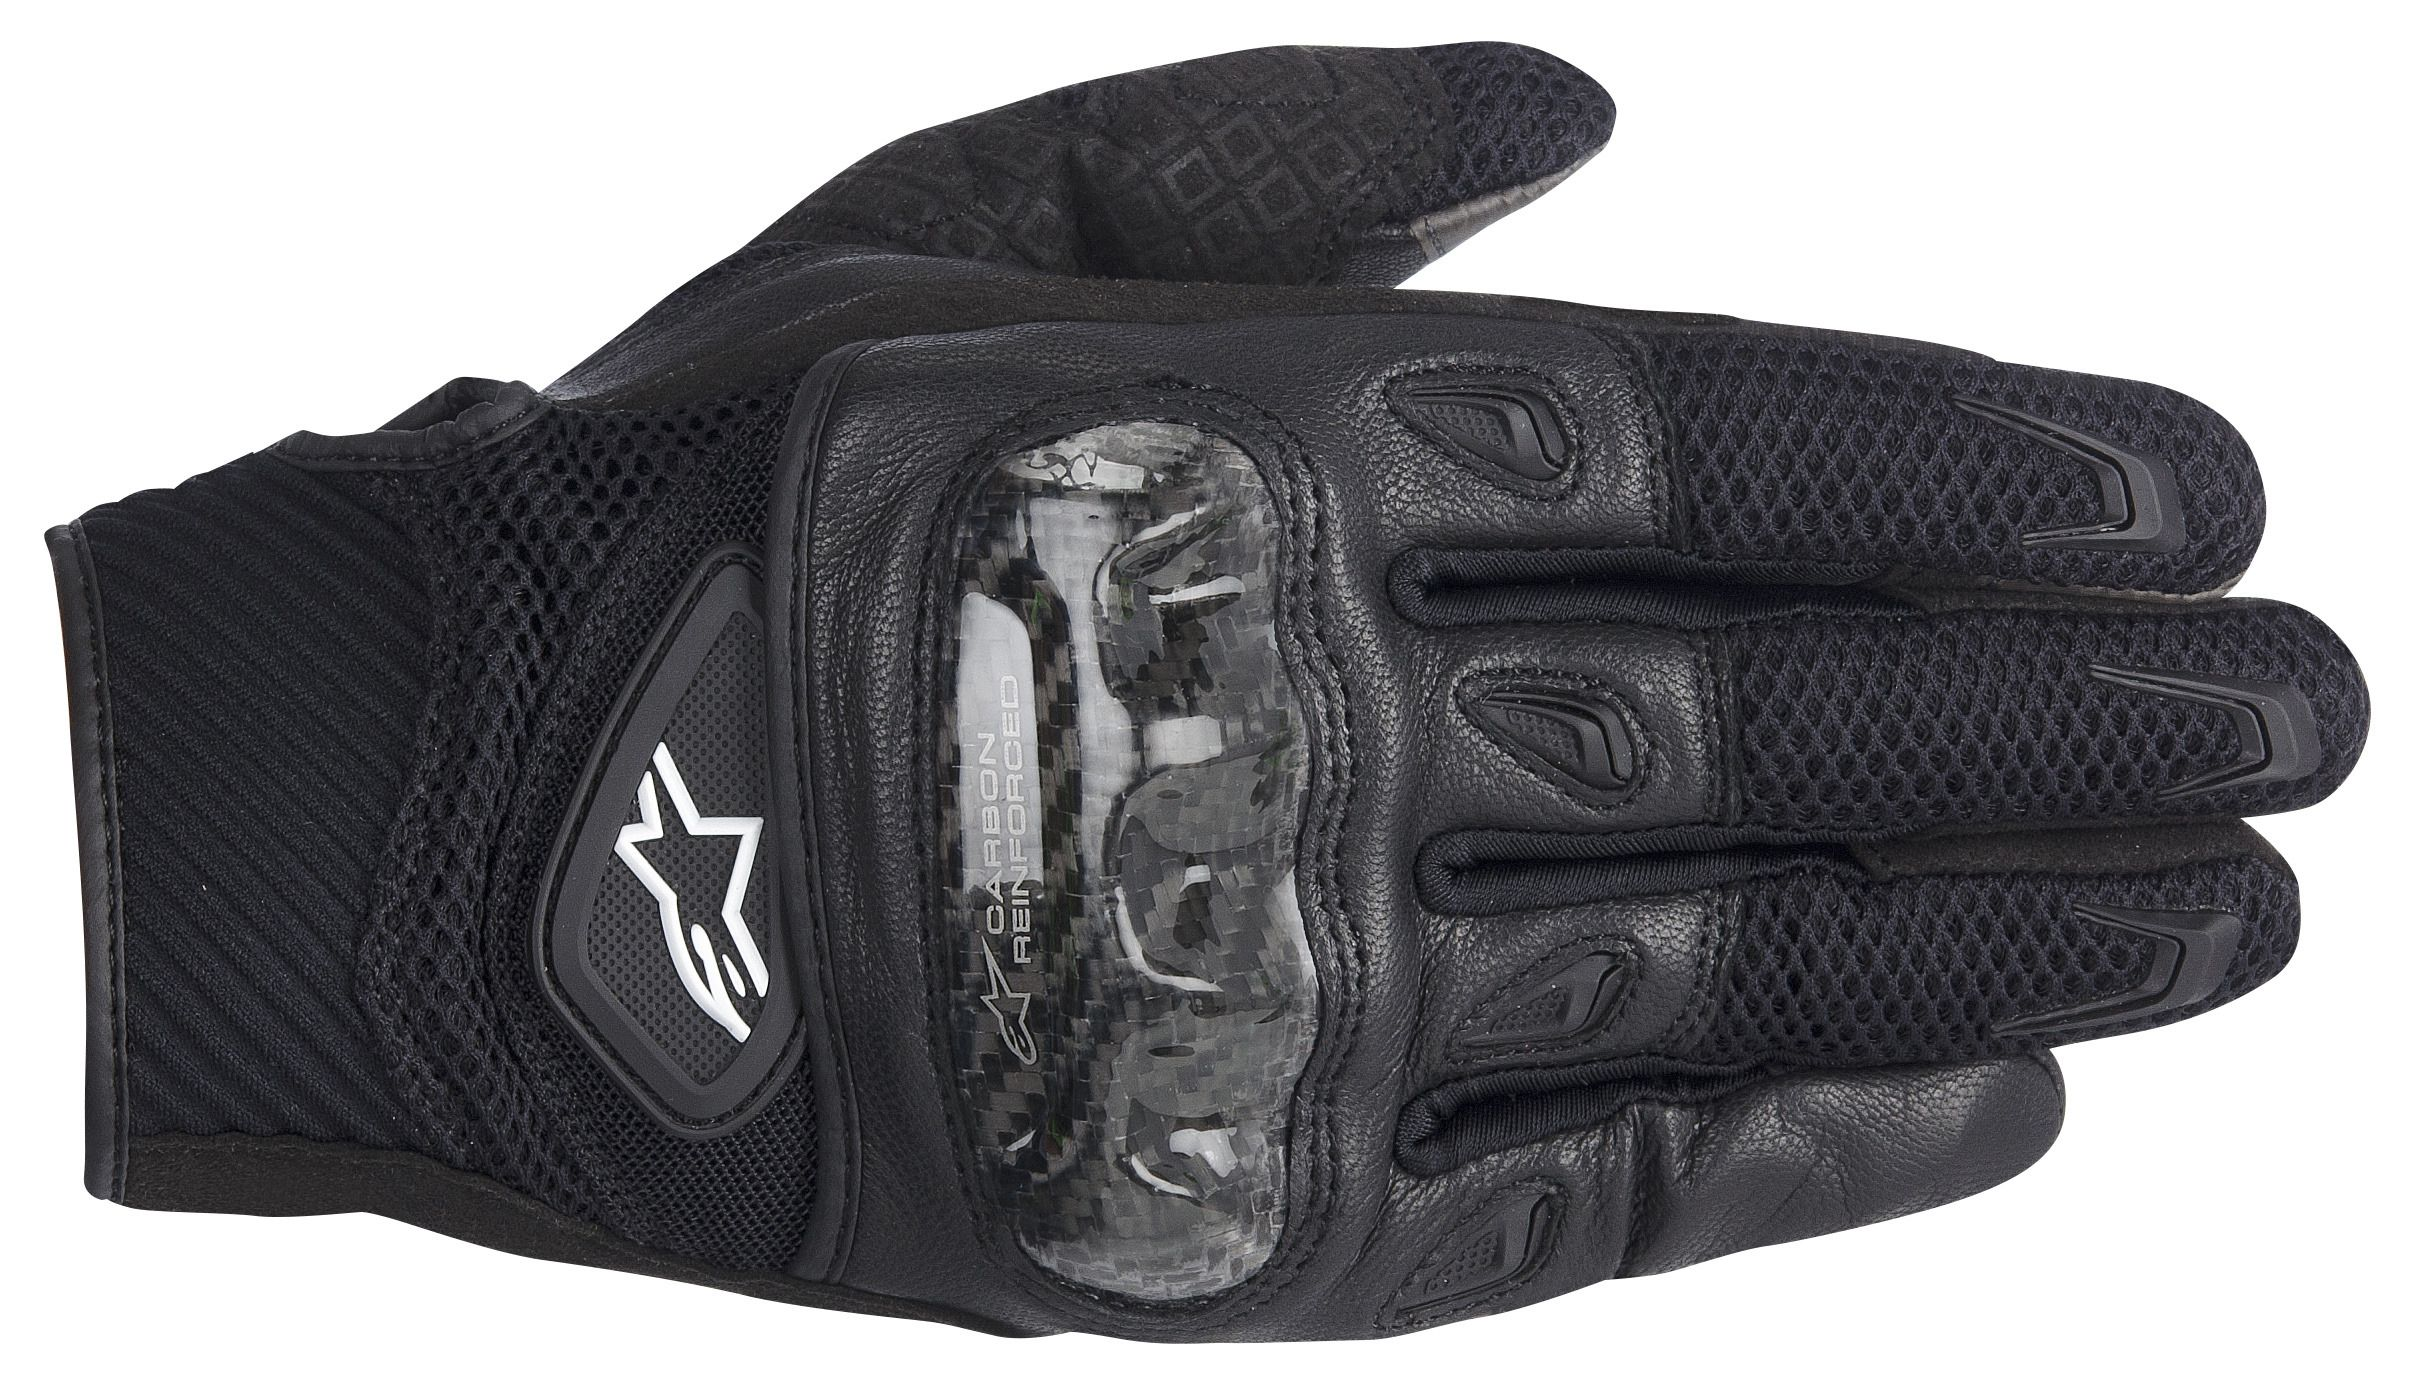 Alpinestars Touring Gloves